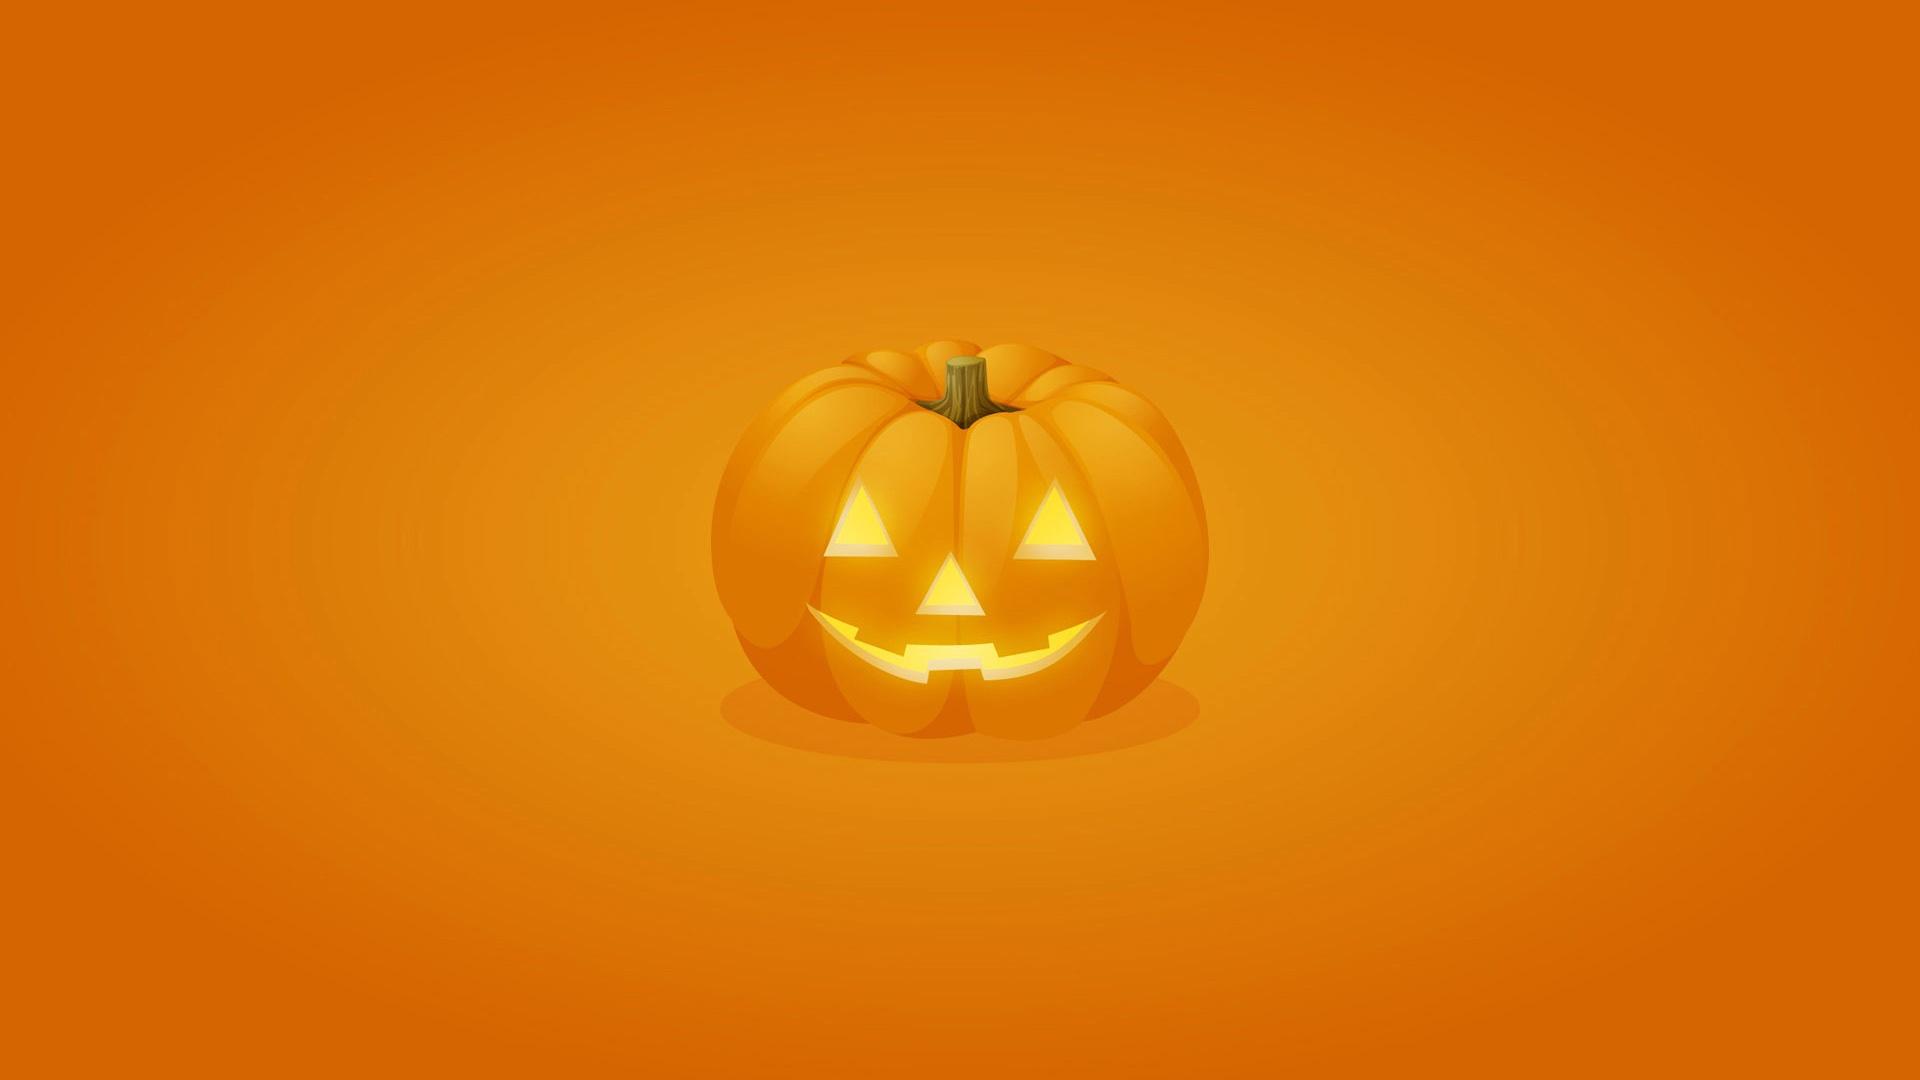 Halloween Pumpkin Wallpapers HD Wallpapers 1920x1080